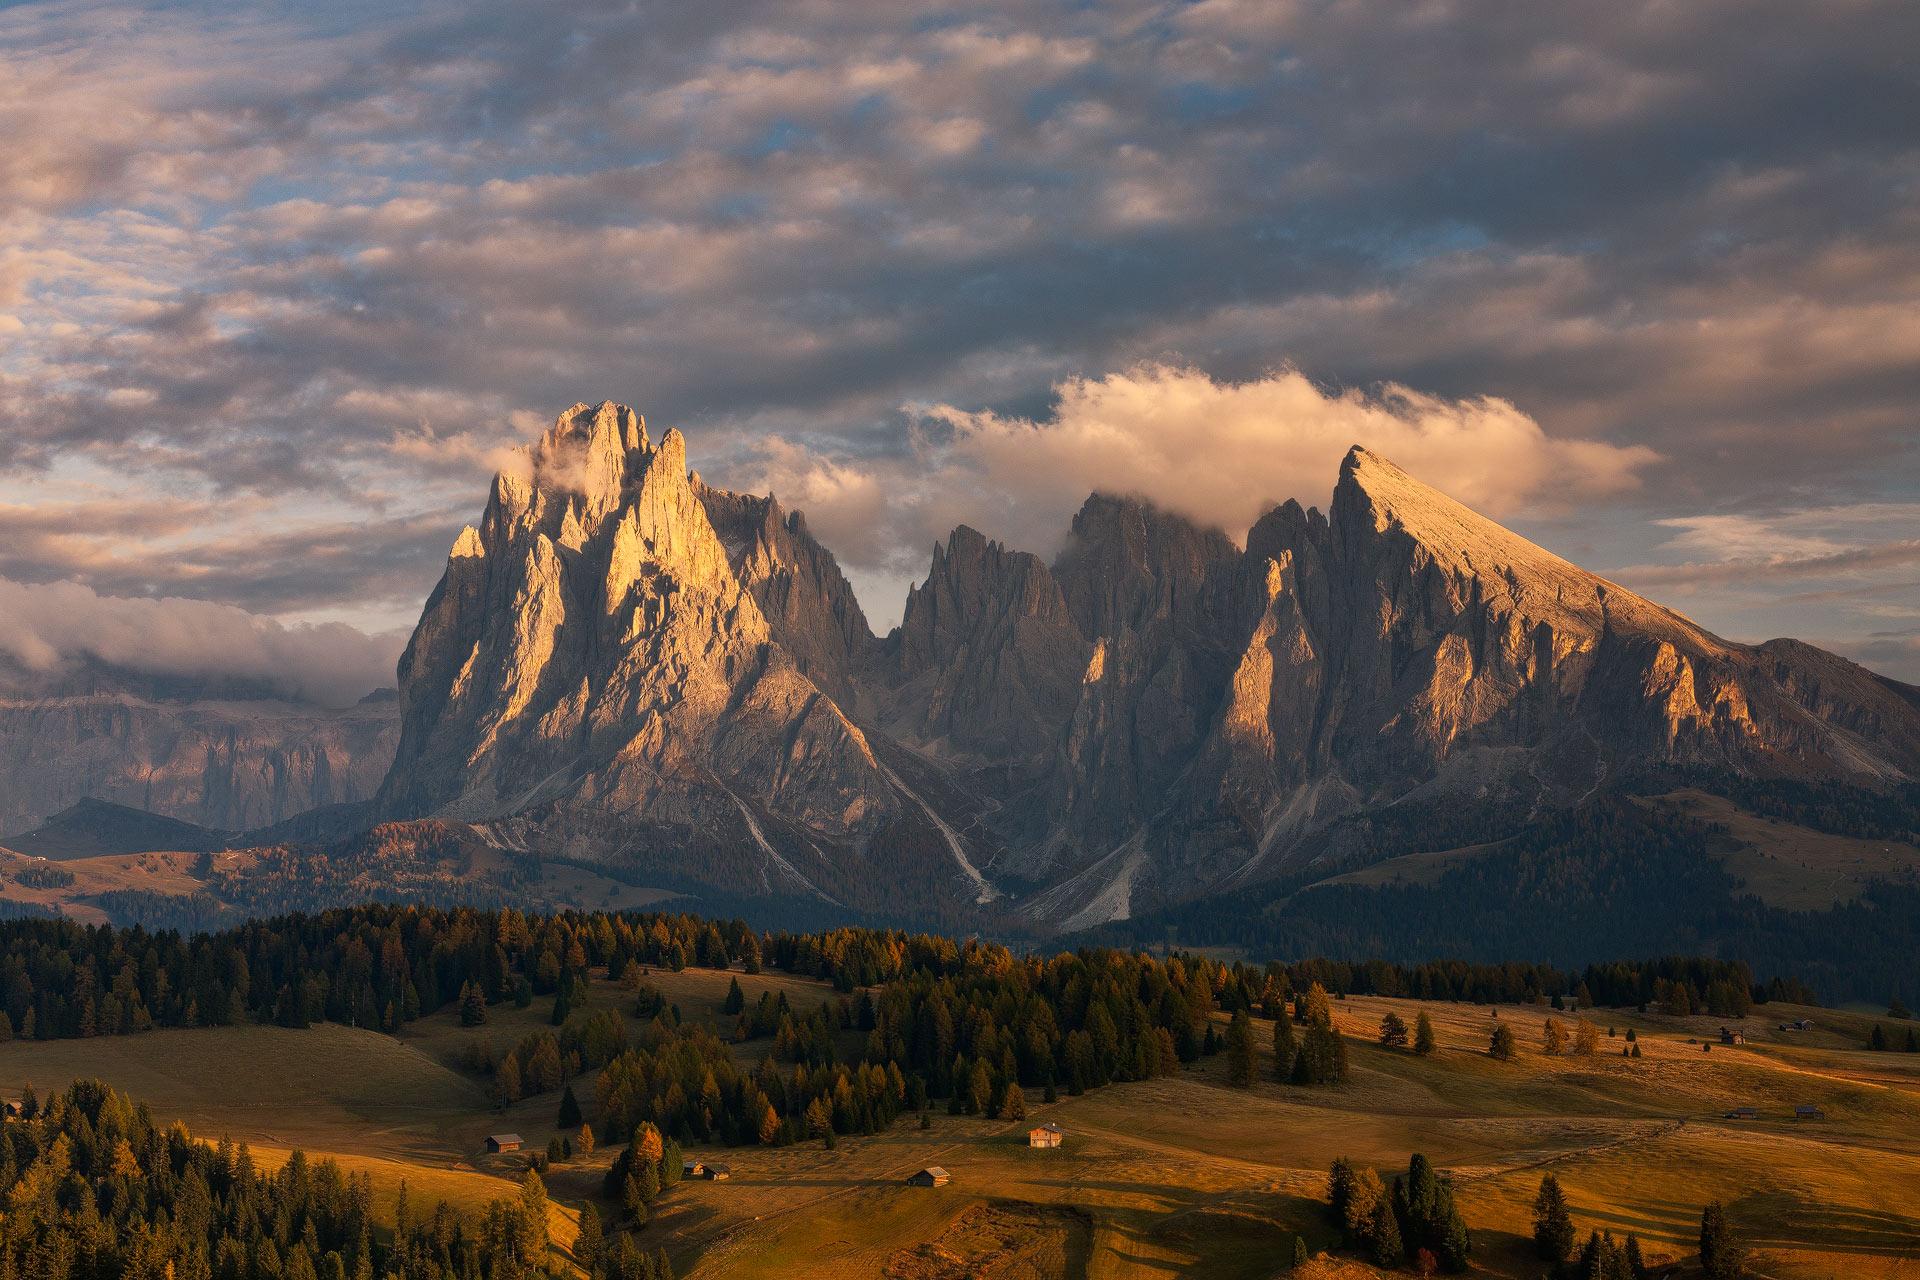 Alpe di Siusi - Dolomiti